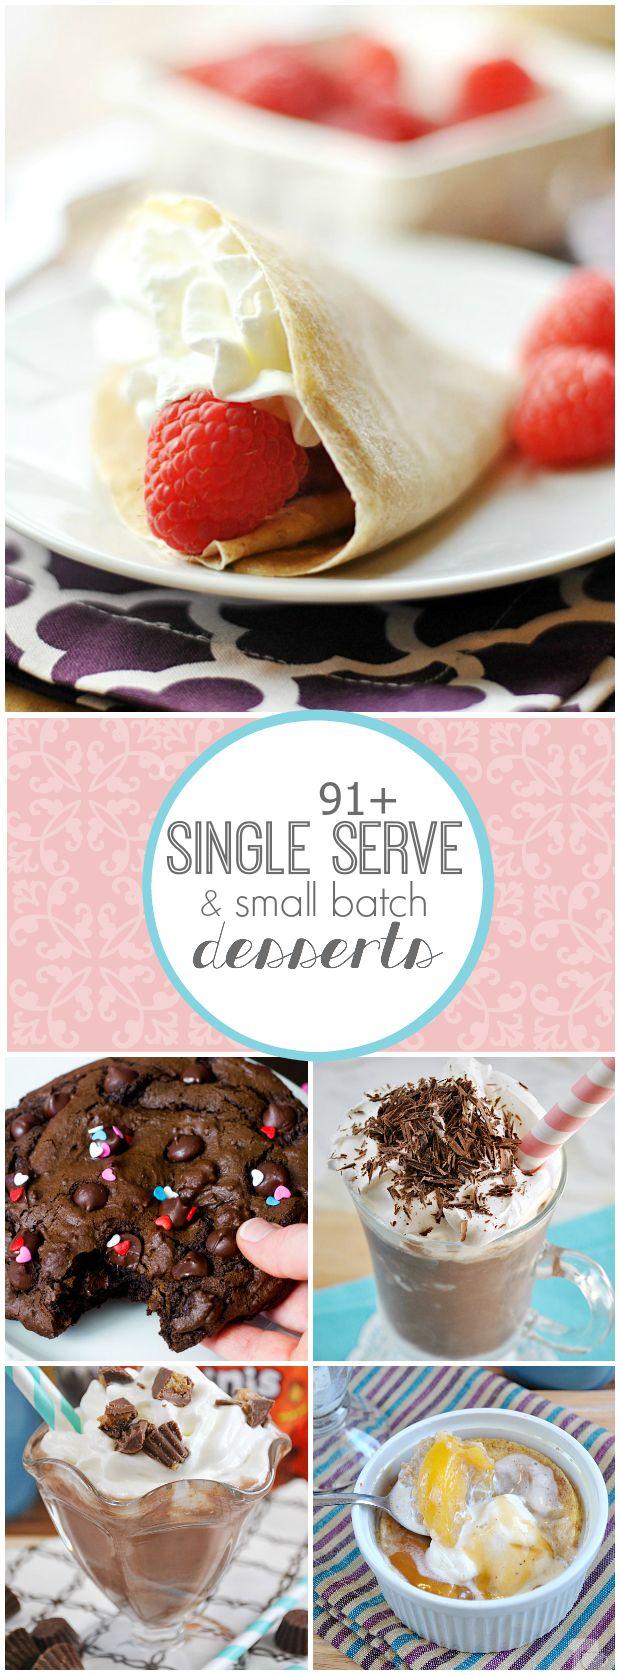 91+ Small Batch and Single Serve Dessert Recipes